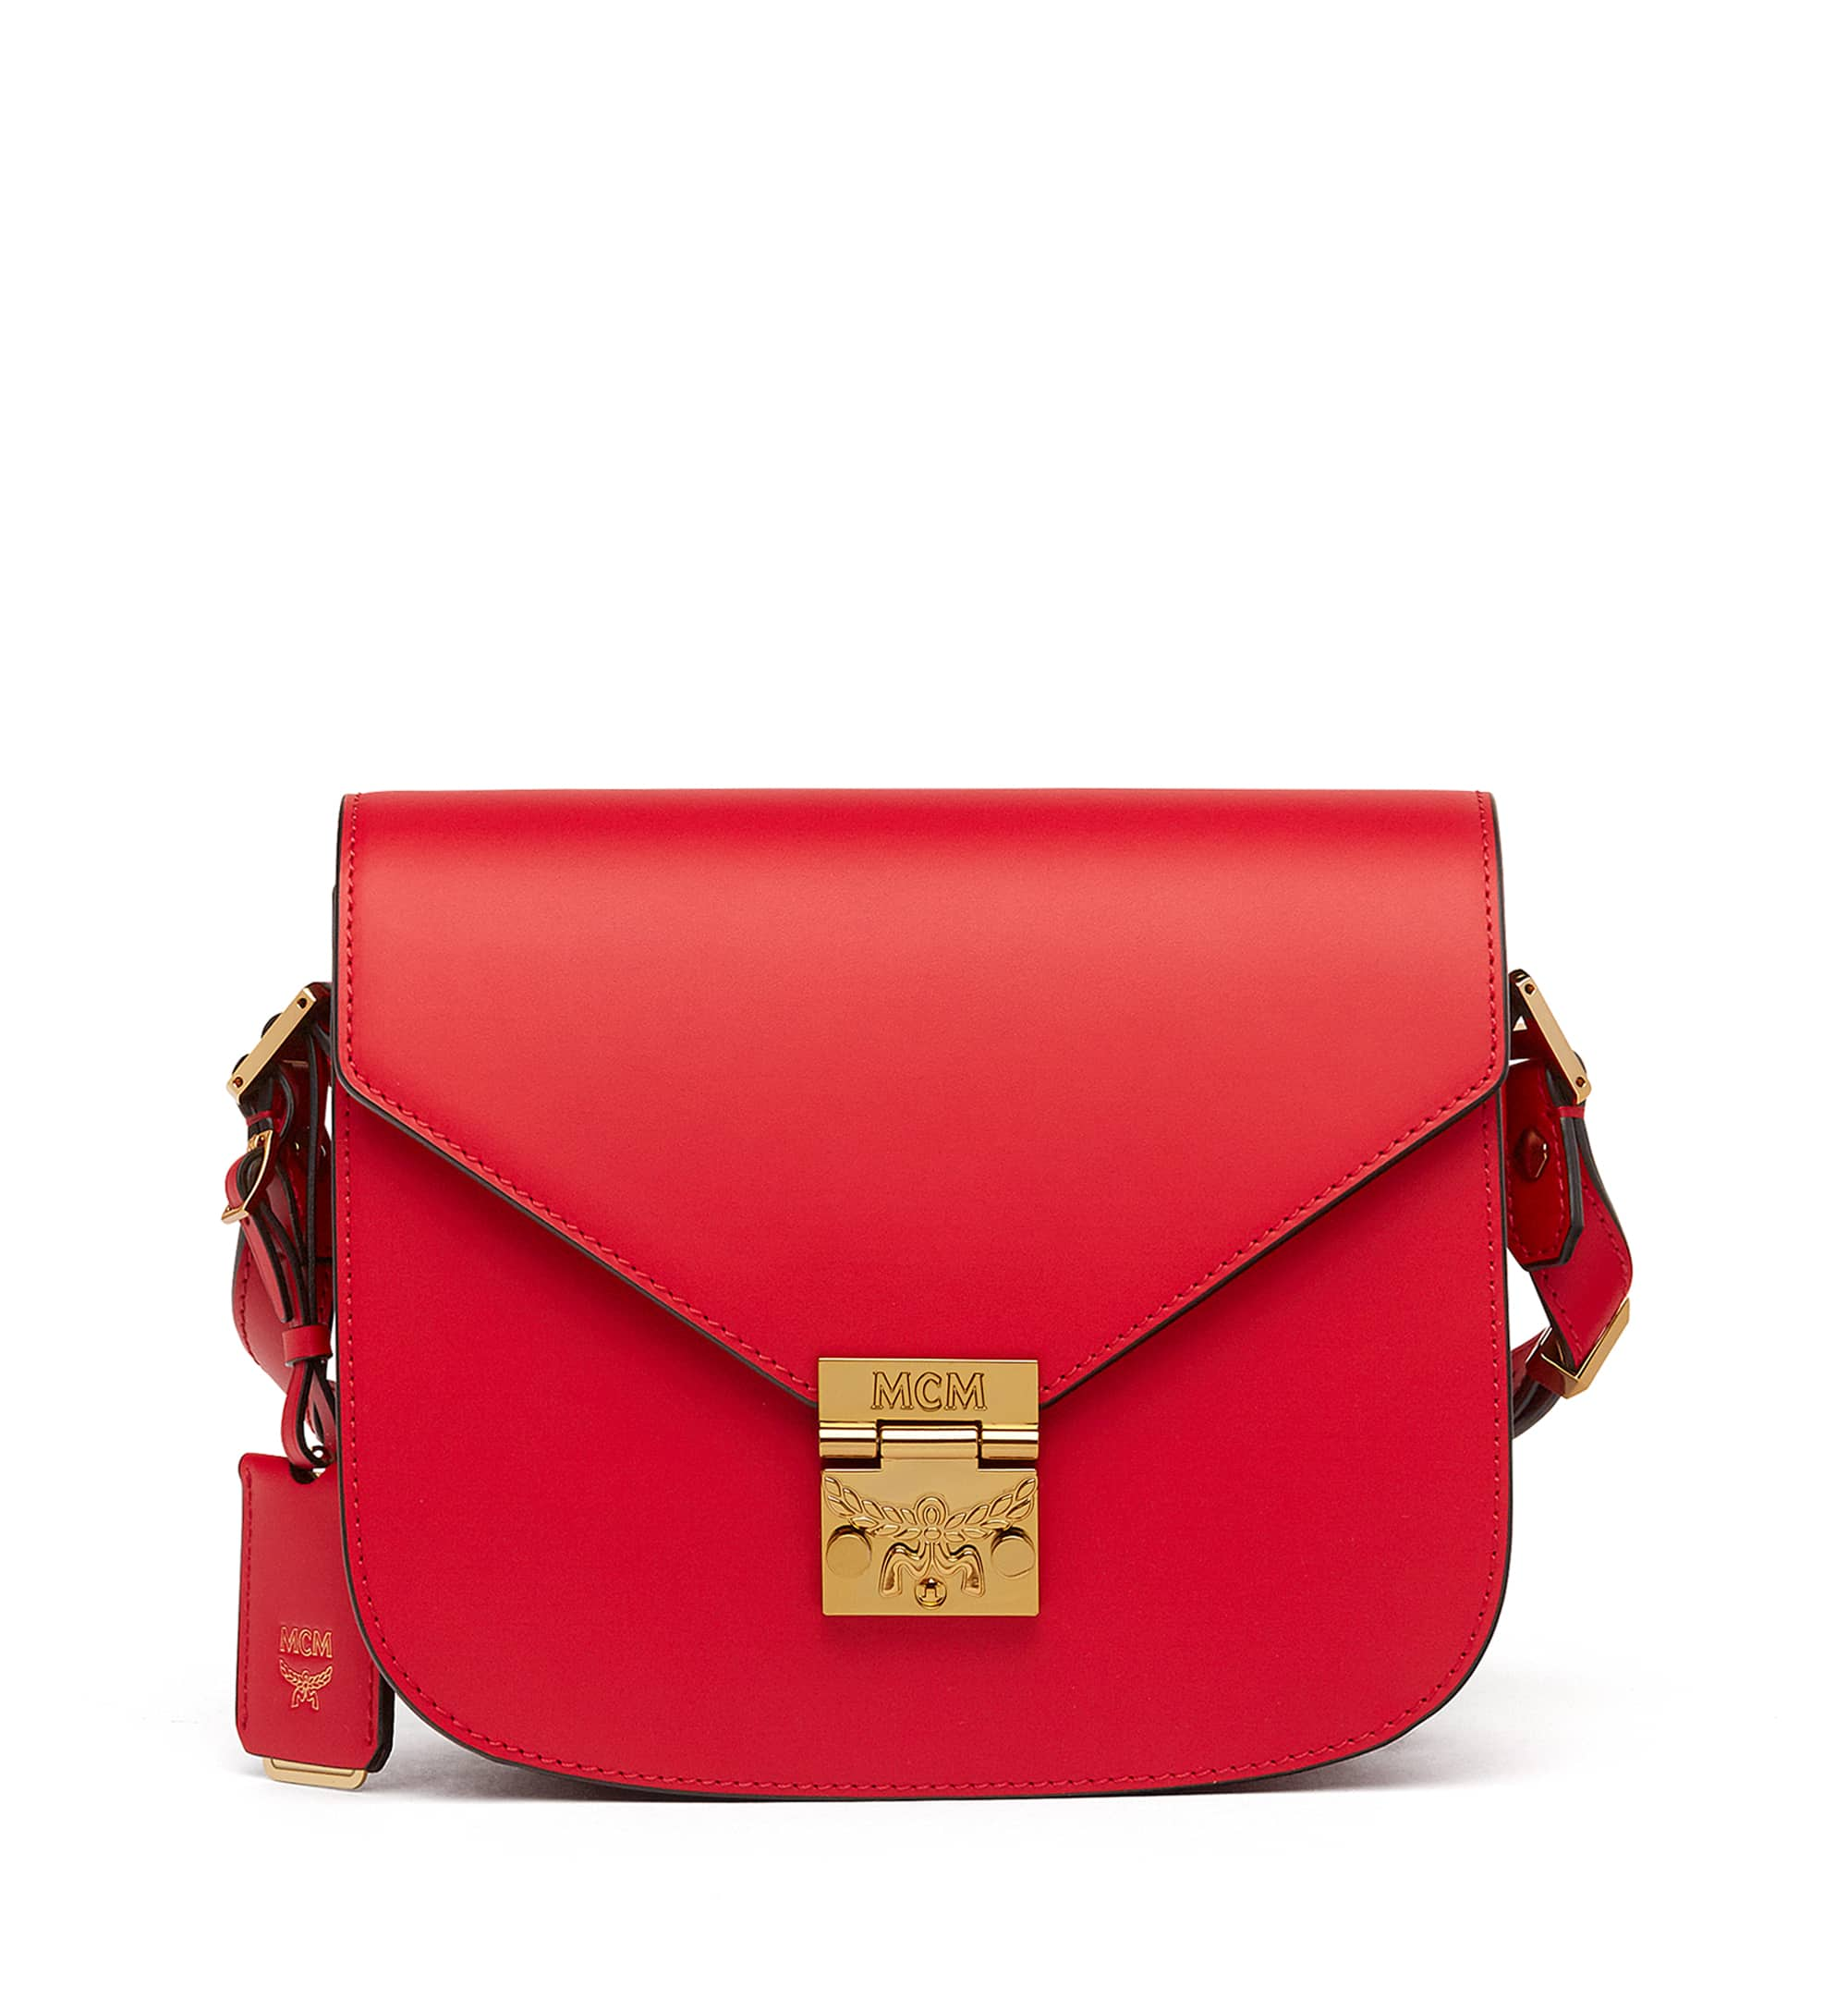 Mcm Ruby Red Small Patricia Crossbody Bag